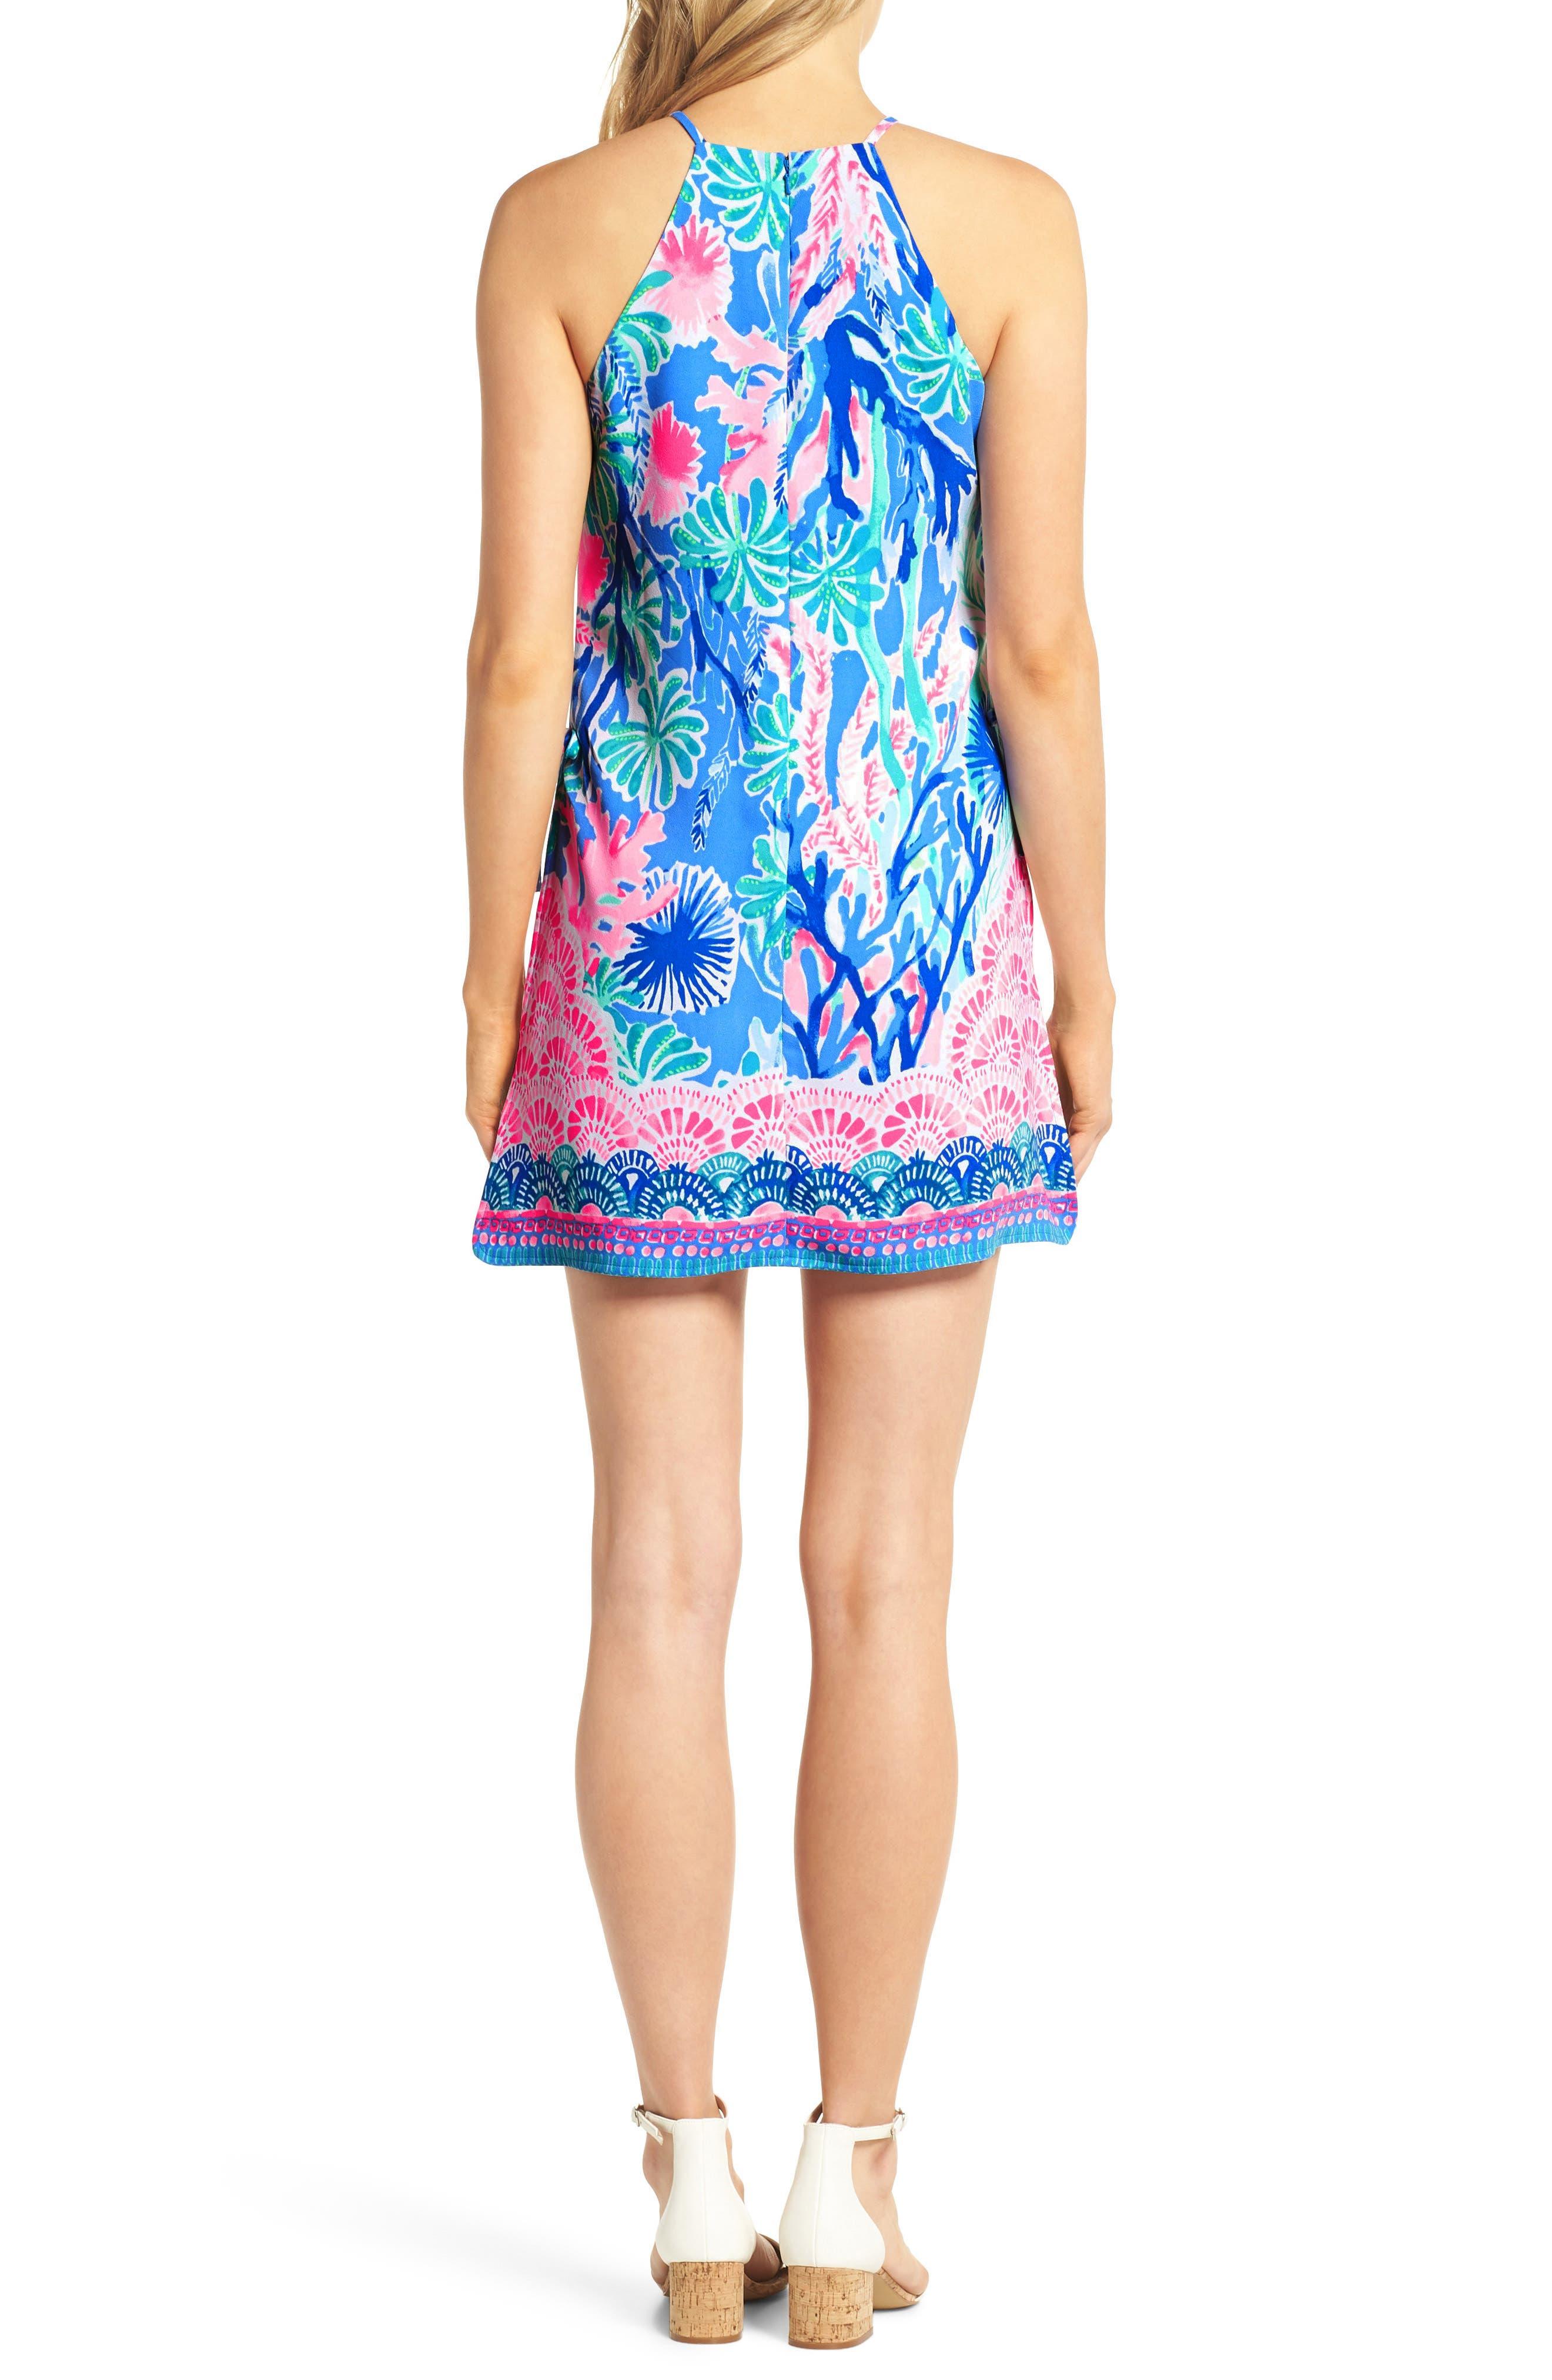 Pearl Romper Dress,                             Alternate thumbnail 2, color,                             Multi Jet Stream